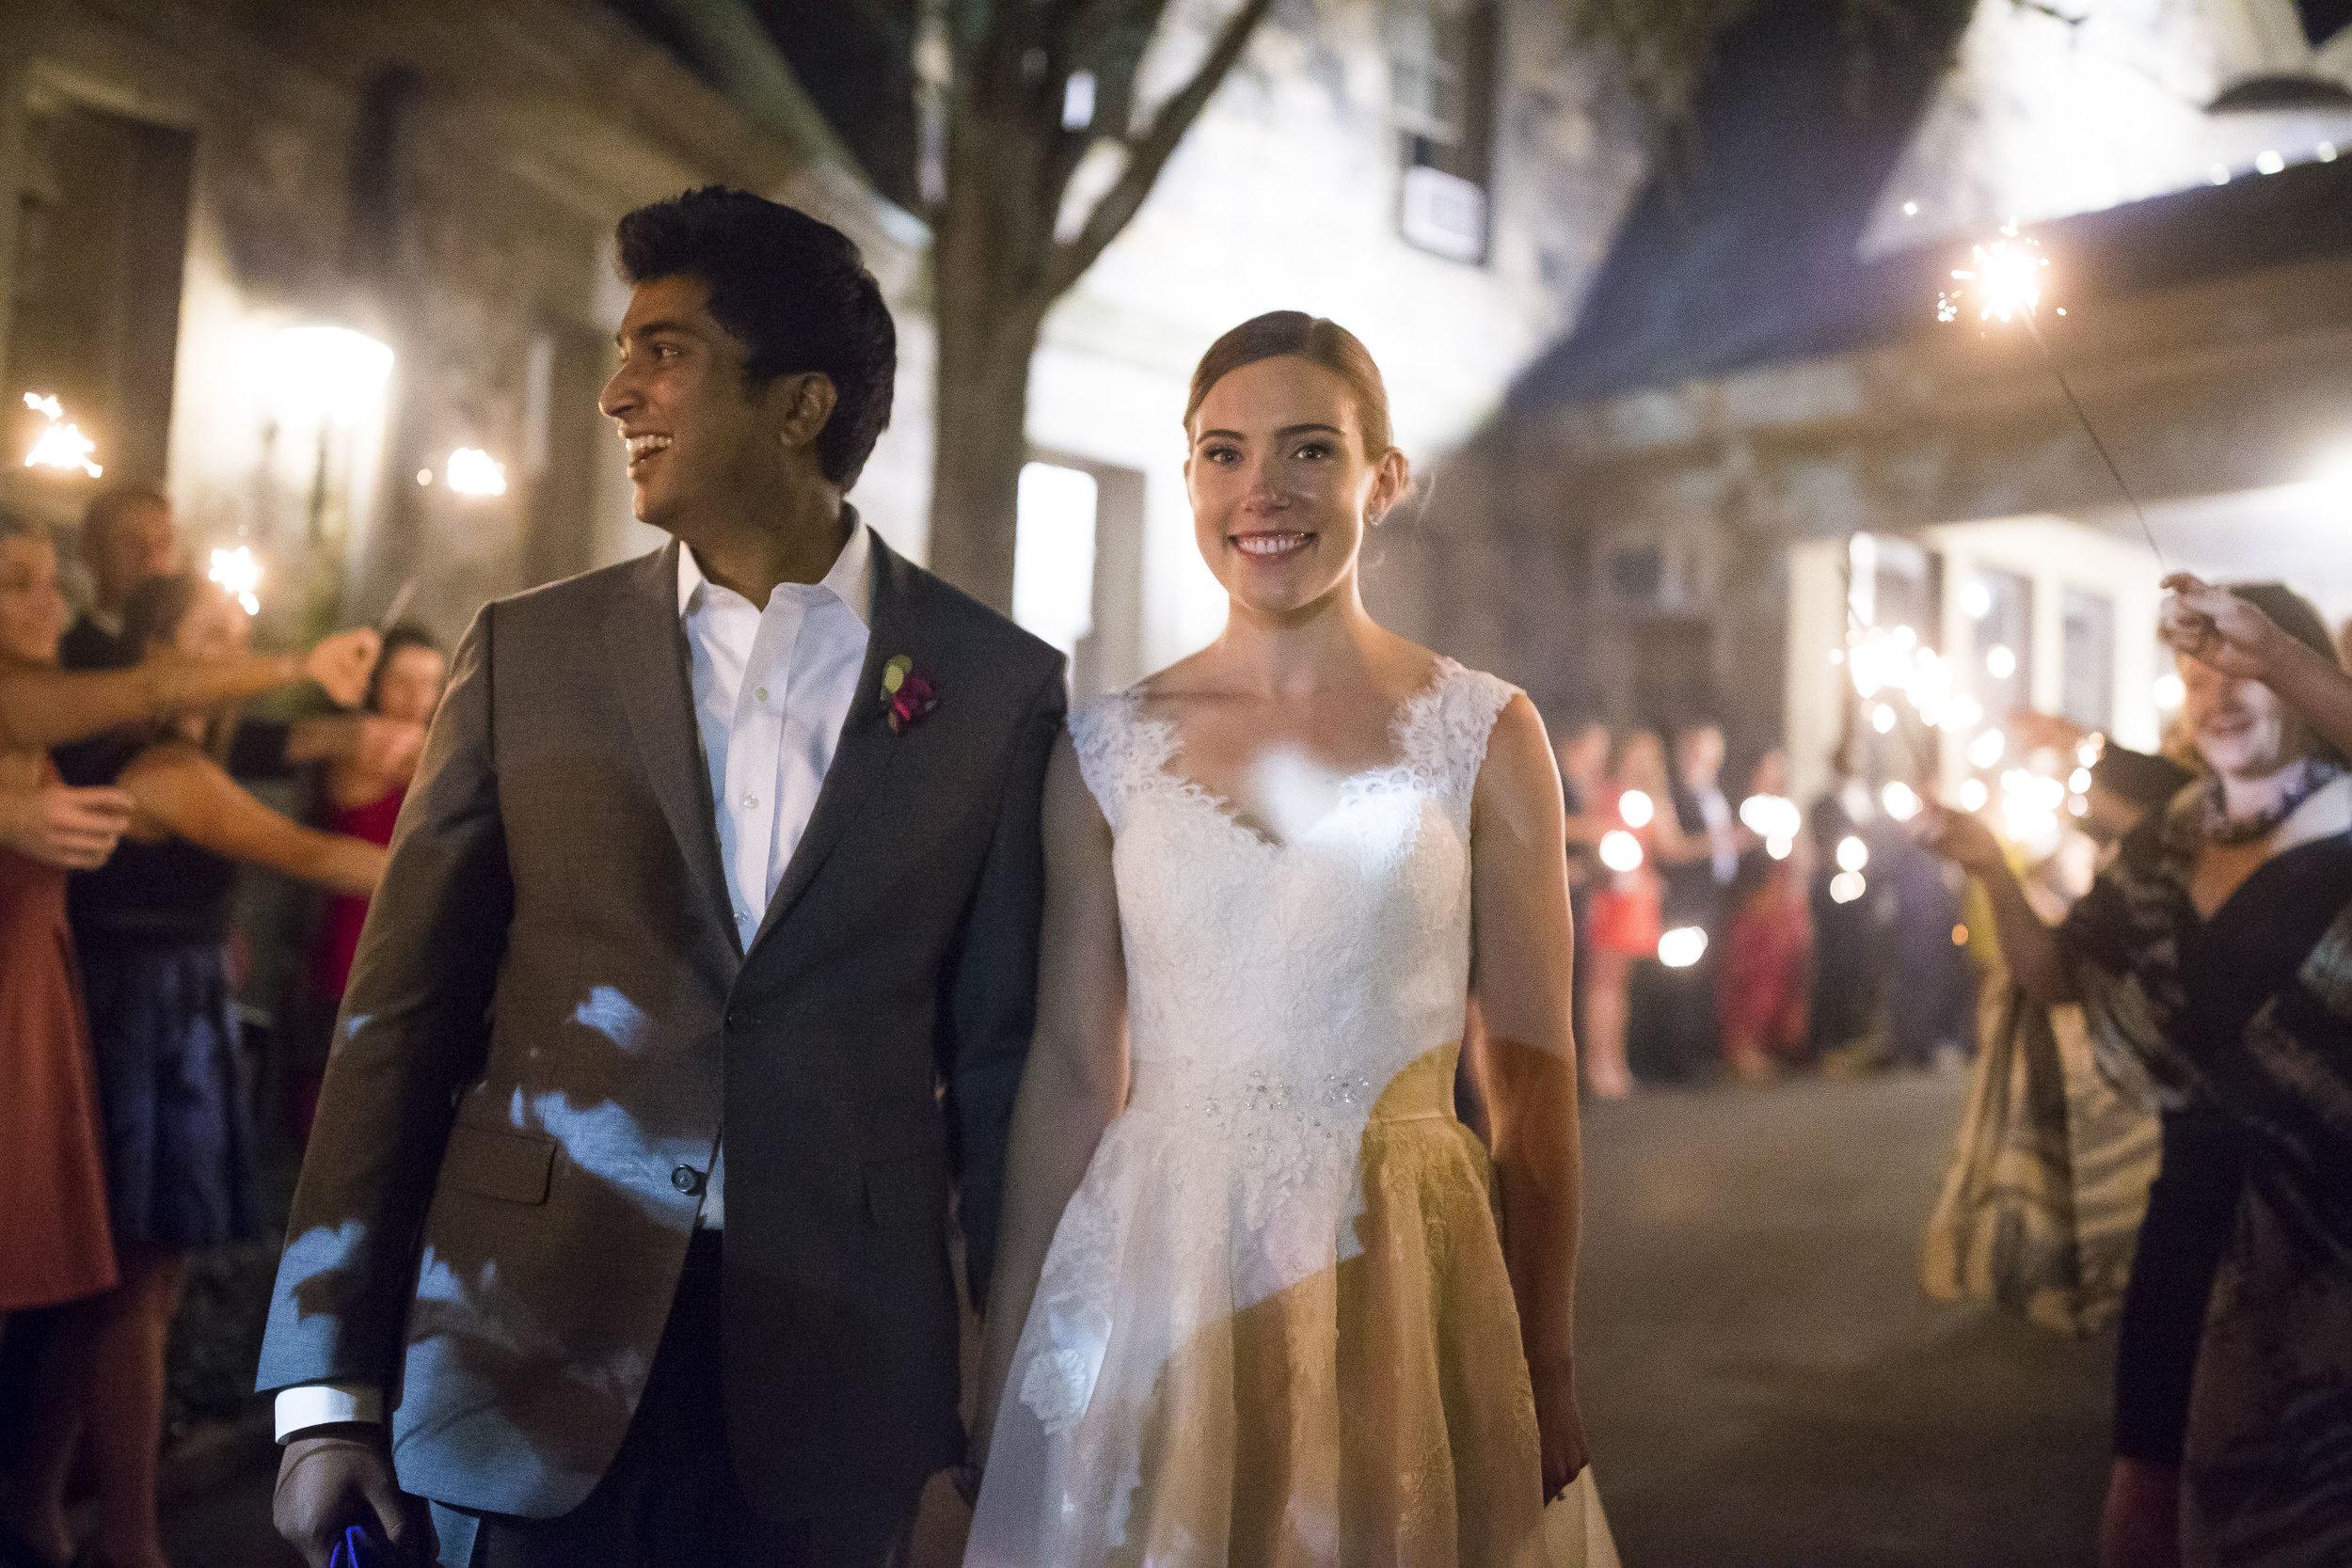 Tappan-Hill-Wedding-Photographer-0051.JPG